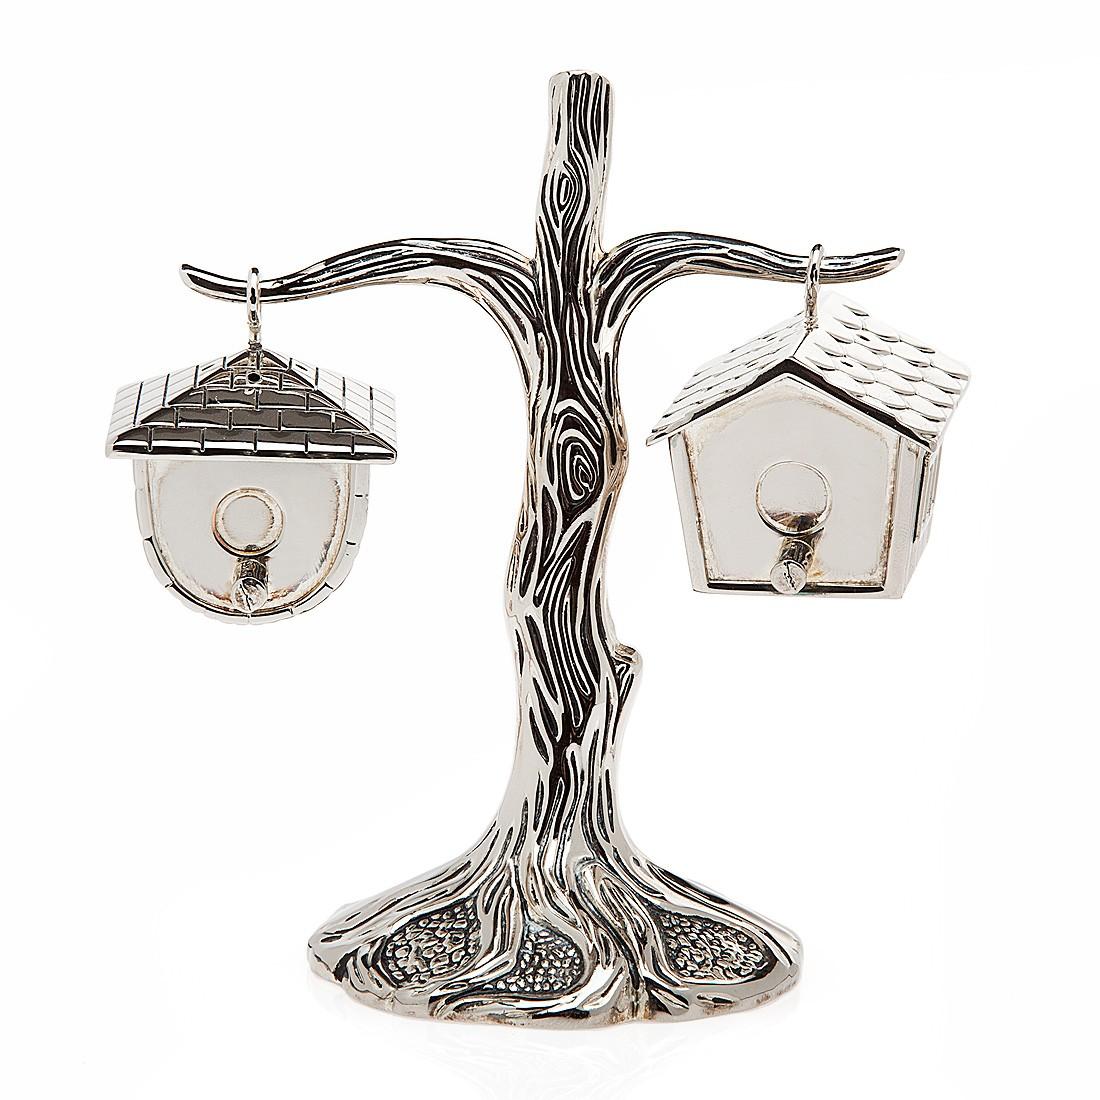 birdhouse graphic design